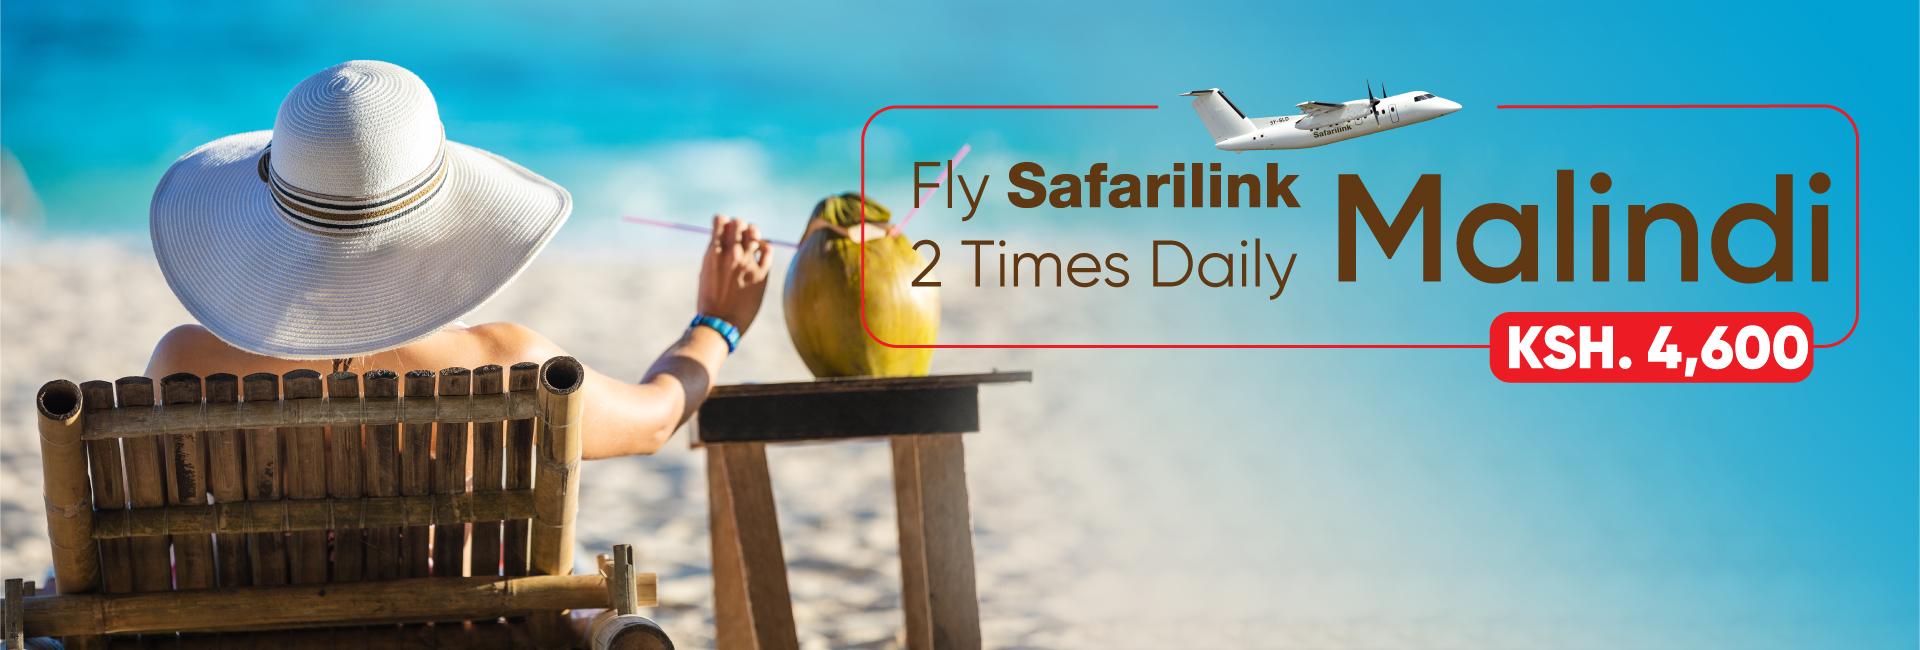 Fly Safarilink To Malindi Deals